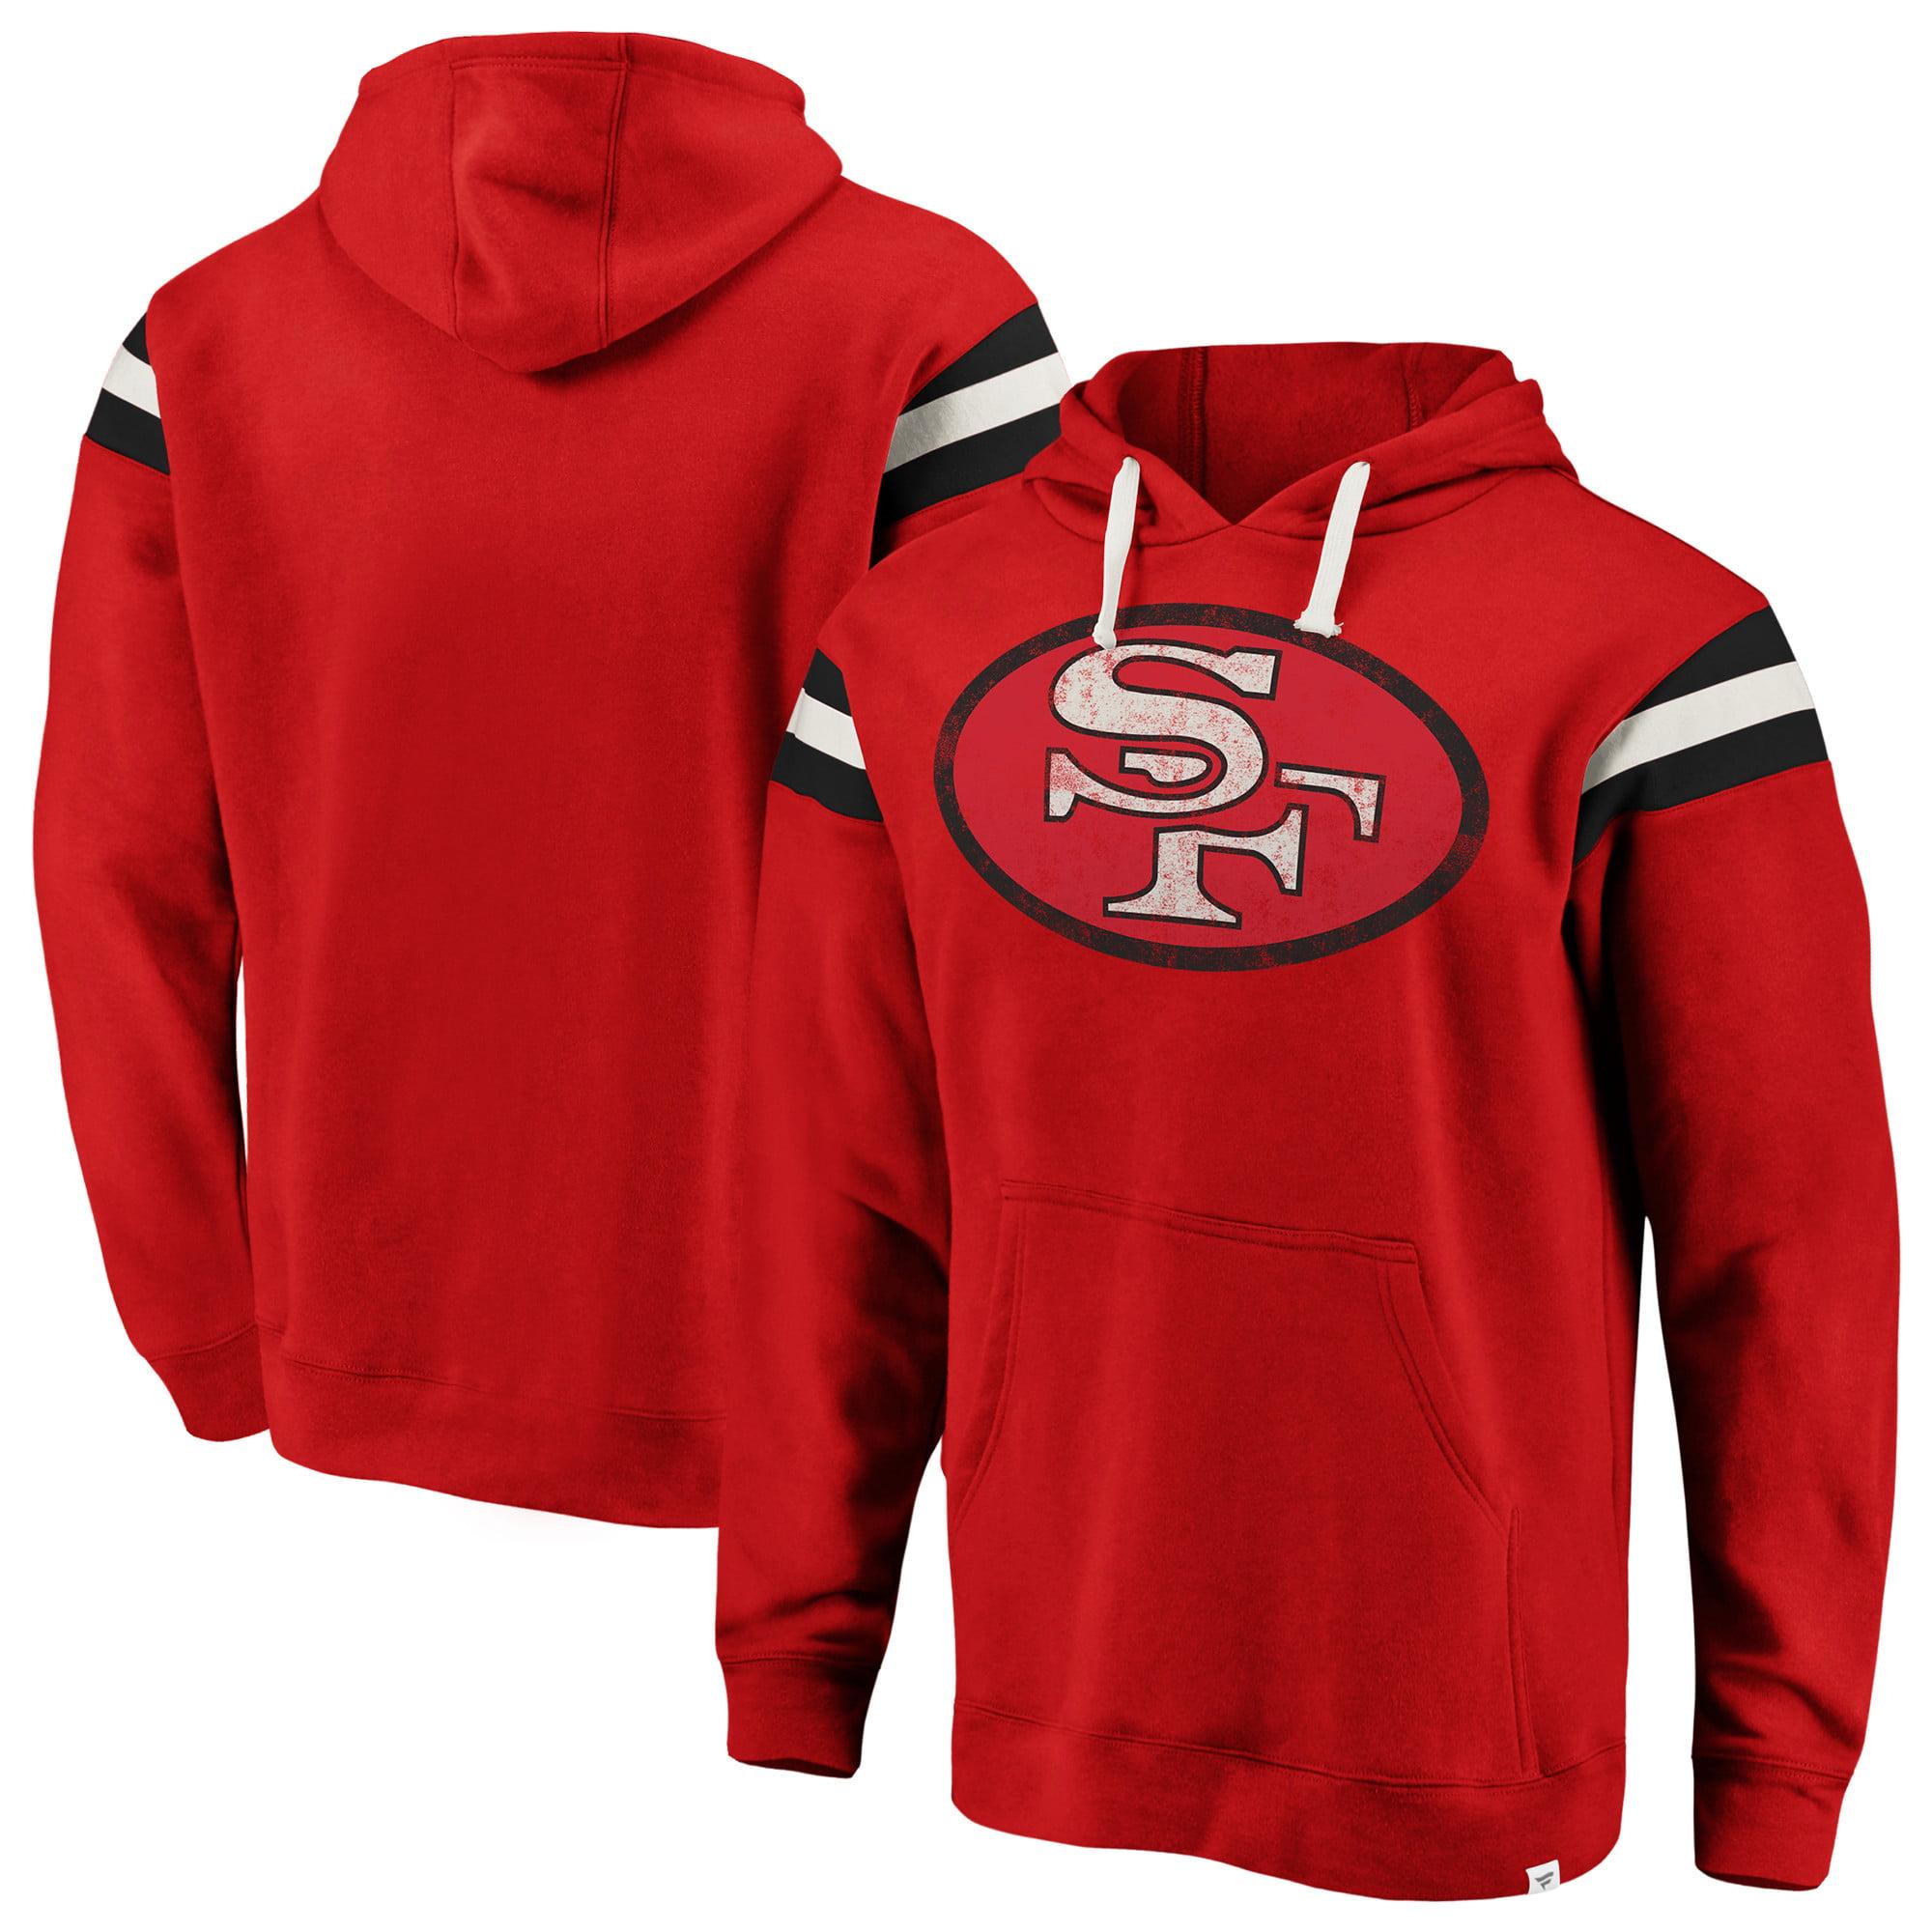 fee322e1f San Francisco 49ers NFL Pro Line by Fanatics Branded Big & Tall True  Classics Retro Stripe Pullover Hoodie - Scarlet - Walmart.com